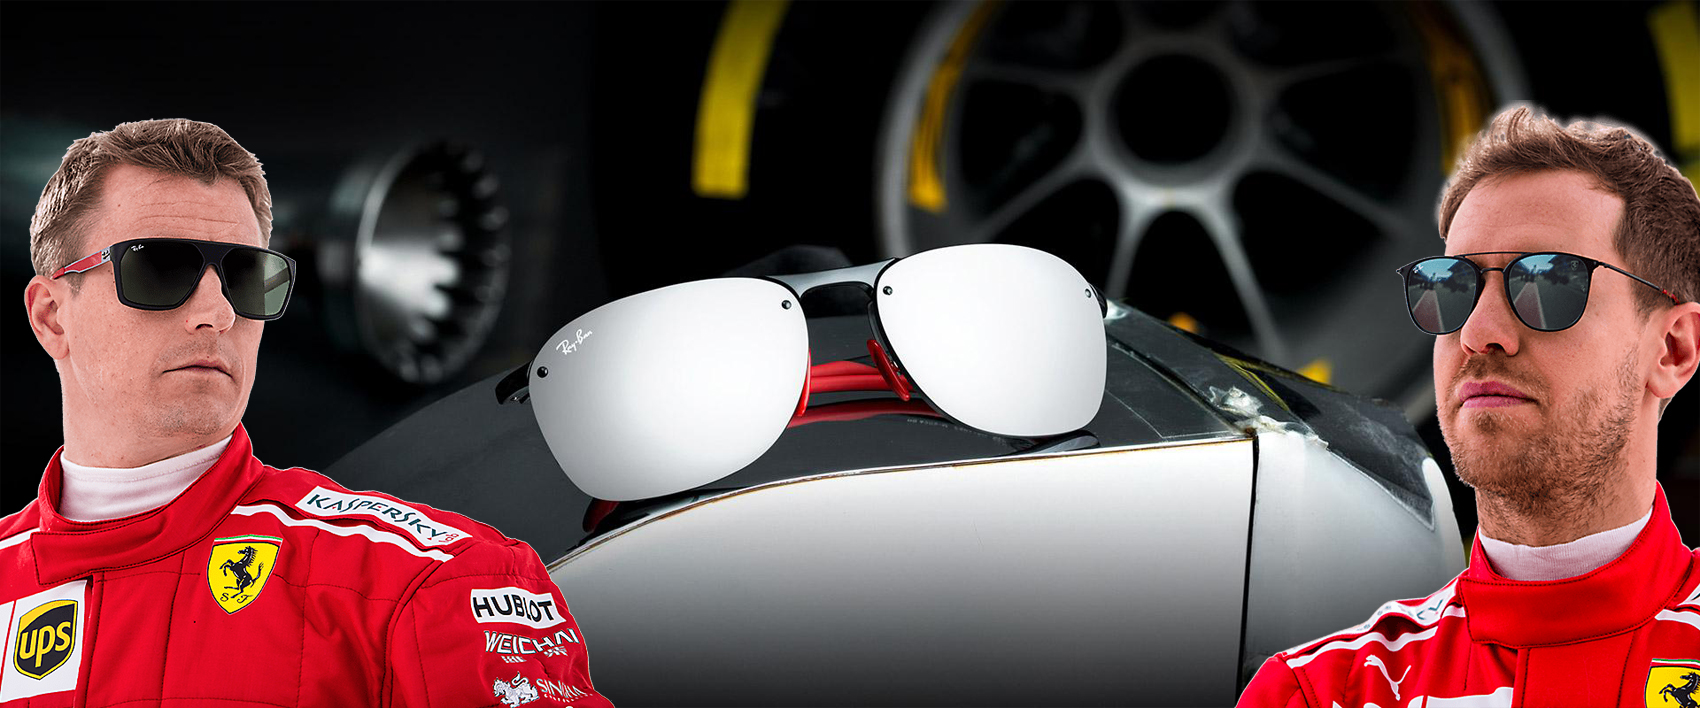 efe12ca4682 Ray-Ban Scuderia Ferrari Collection - Van Born Opticiens | Exclusief ...